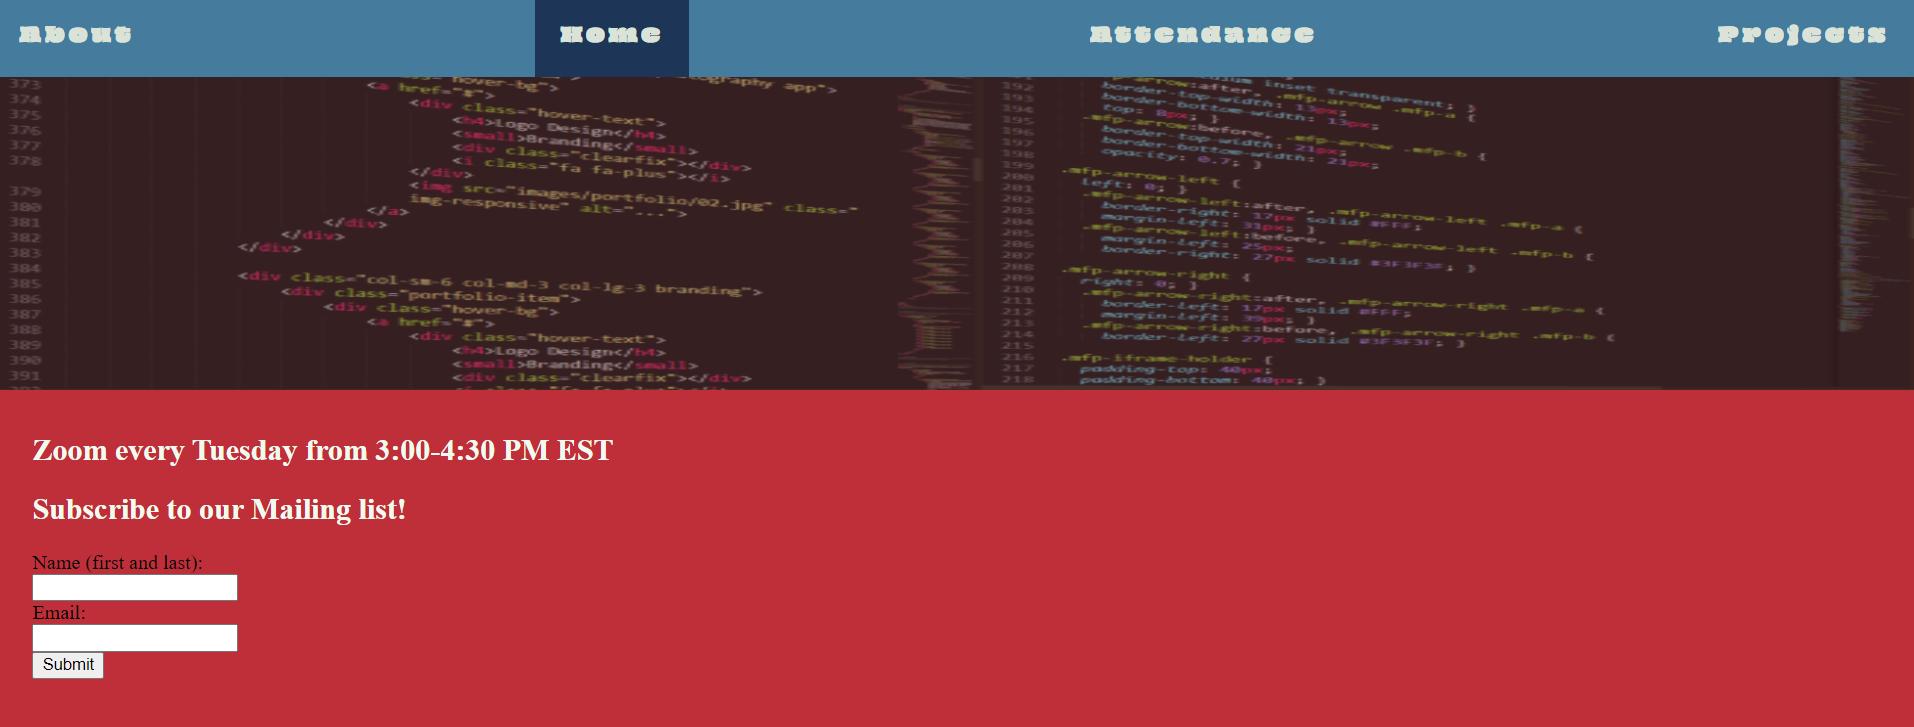 https://cloud-1g3f3rjtp-hack-club-bot.vercel.app/0image.png